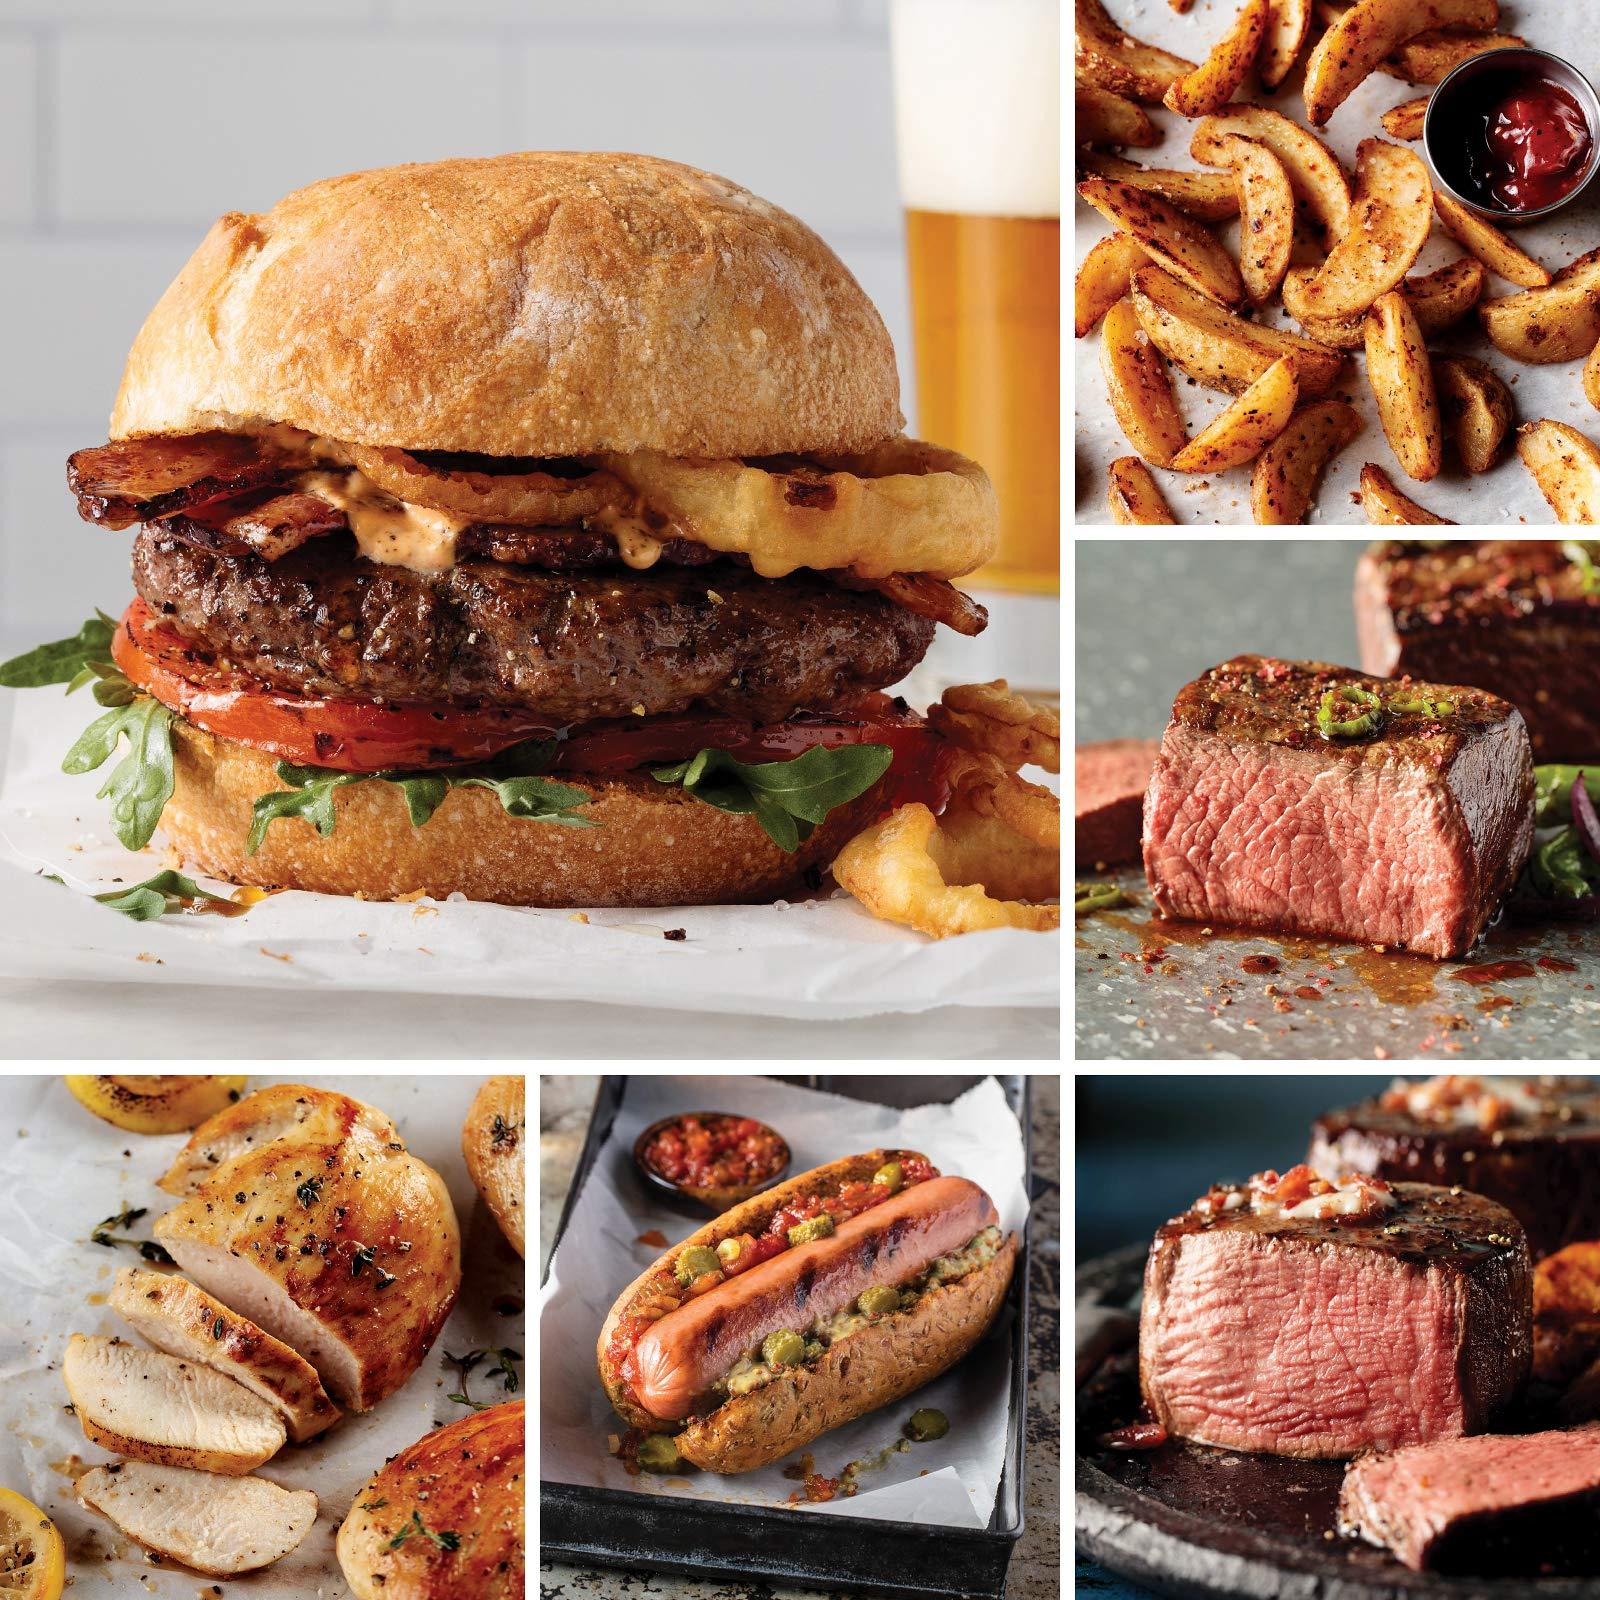 Omaha Steaks The Family Value Combo